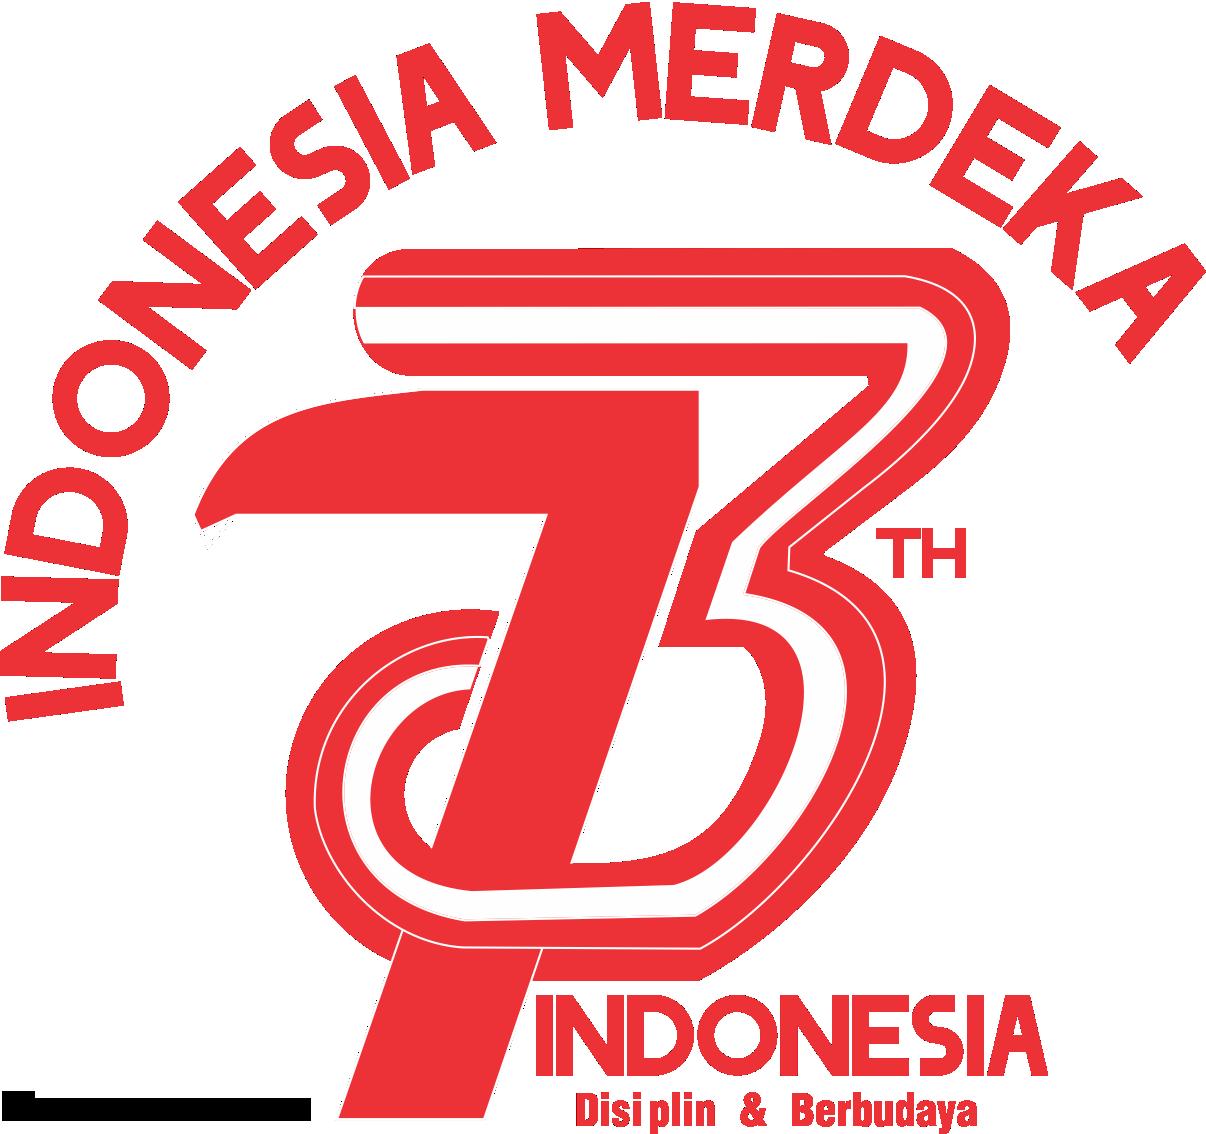 Merdeka 73 Tahun Indonesia Indonesia, Desain logo, Huruf